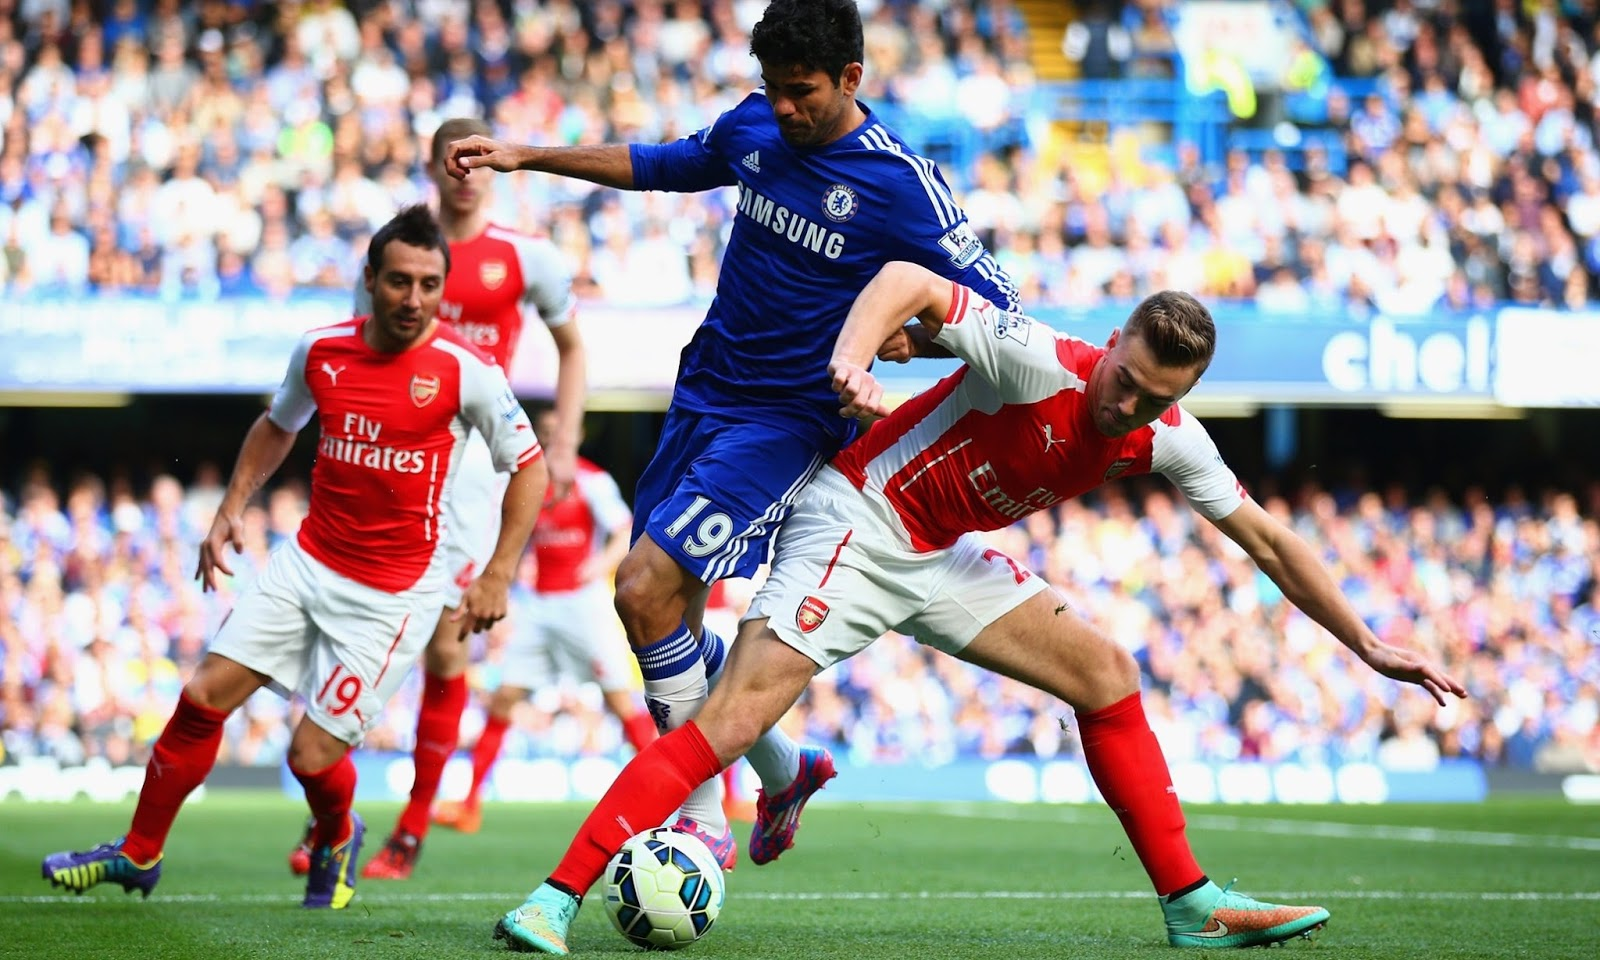 Man City Mot Chelsea: Manchester City Tv Schedules Fixtures Results News